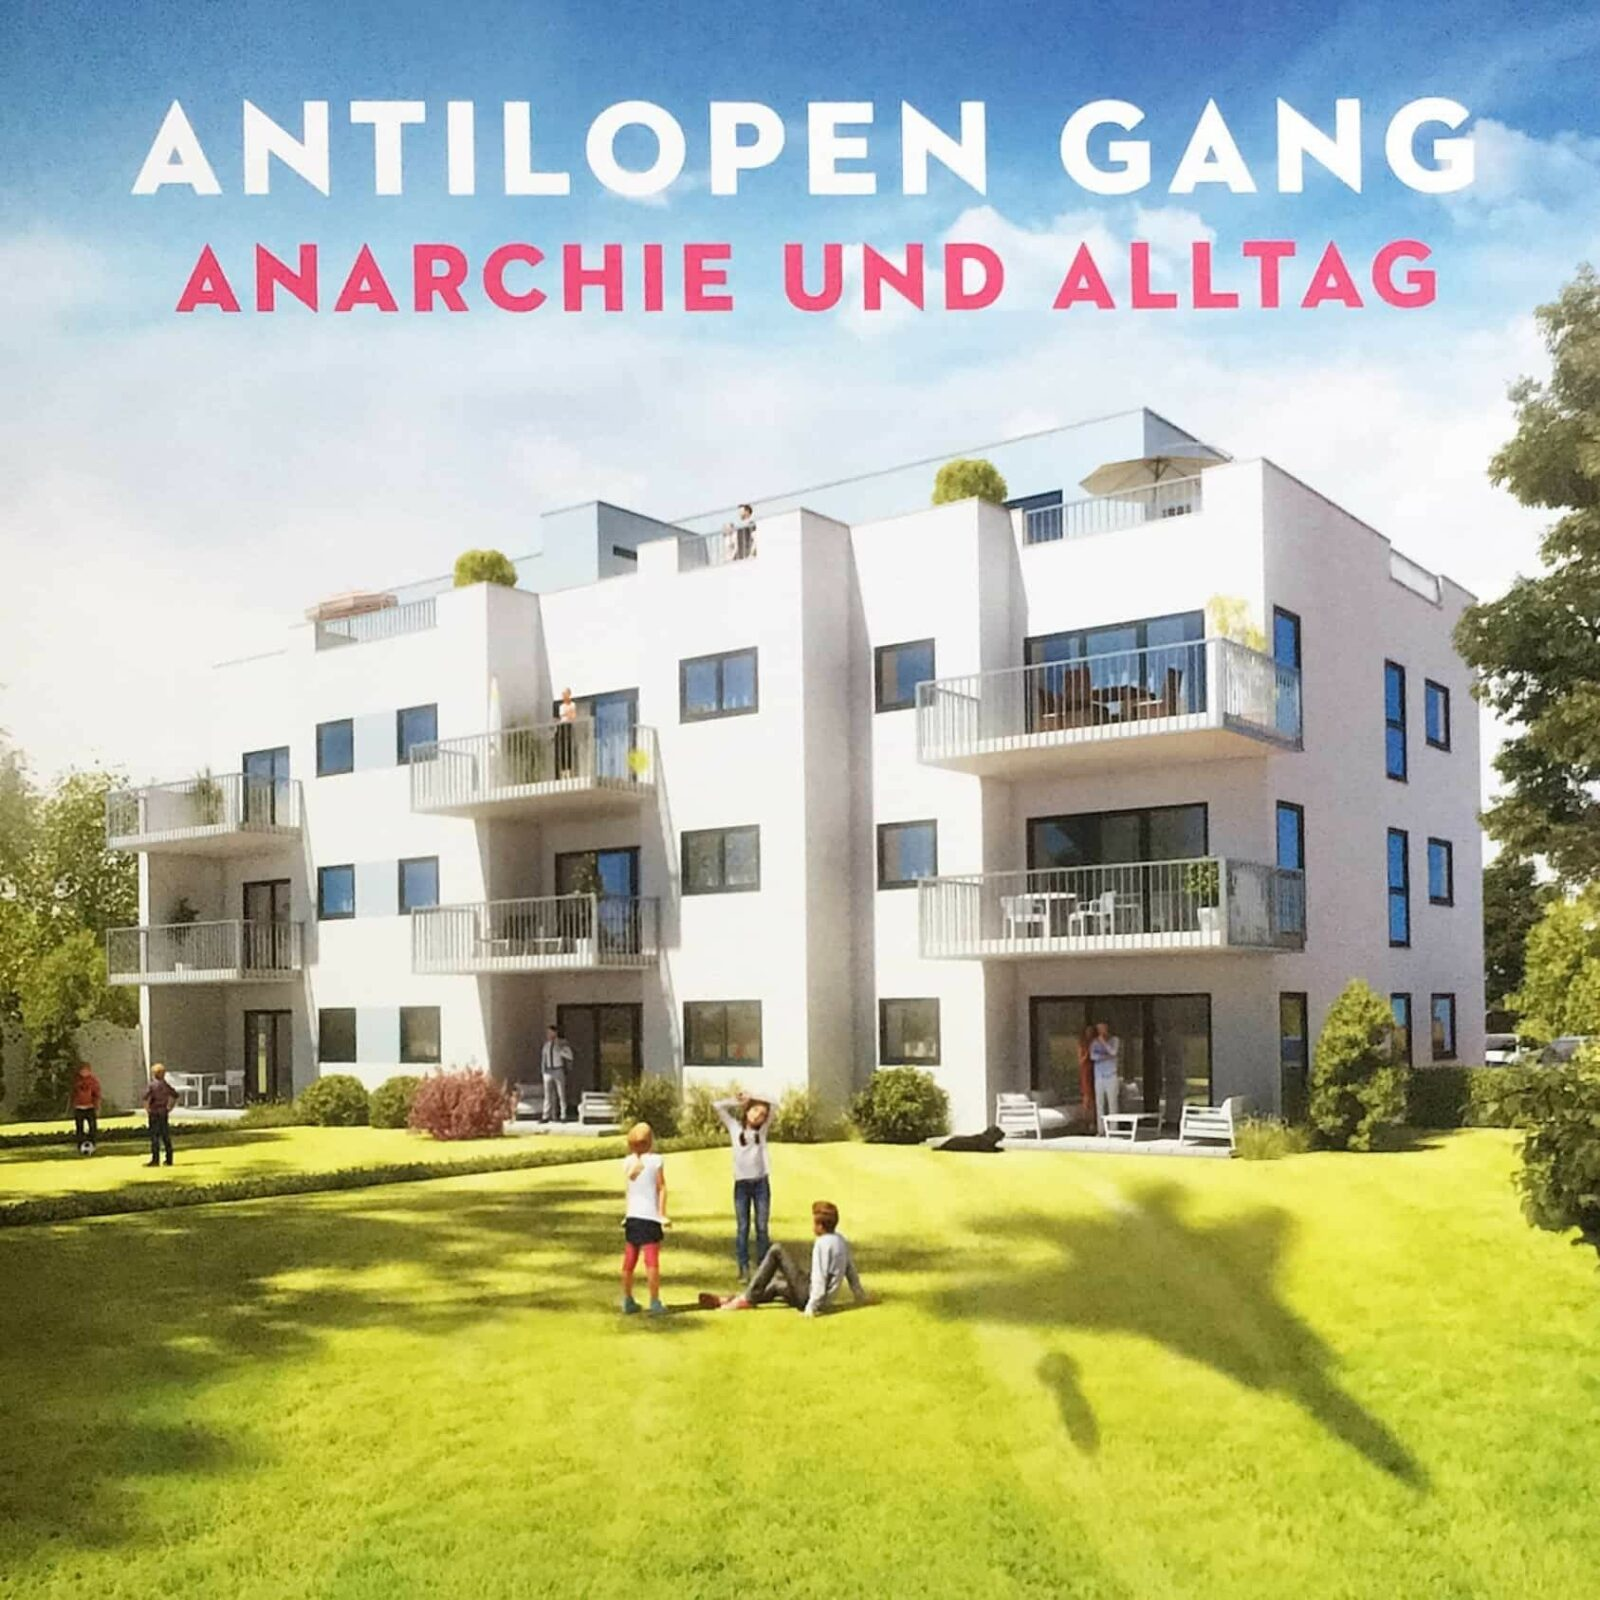 Antilopen Gang - Anarchie und Alltag - Cover Front